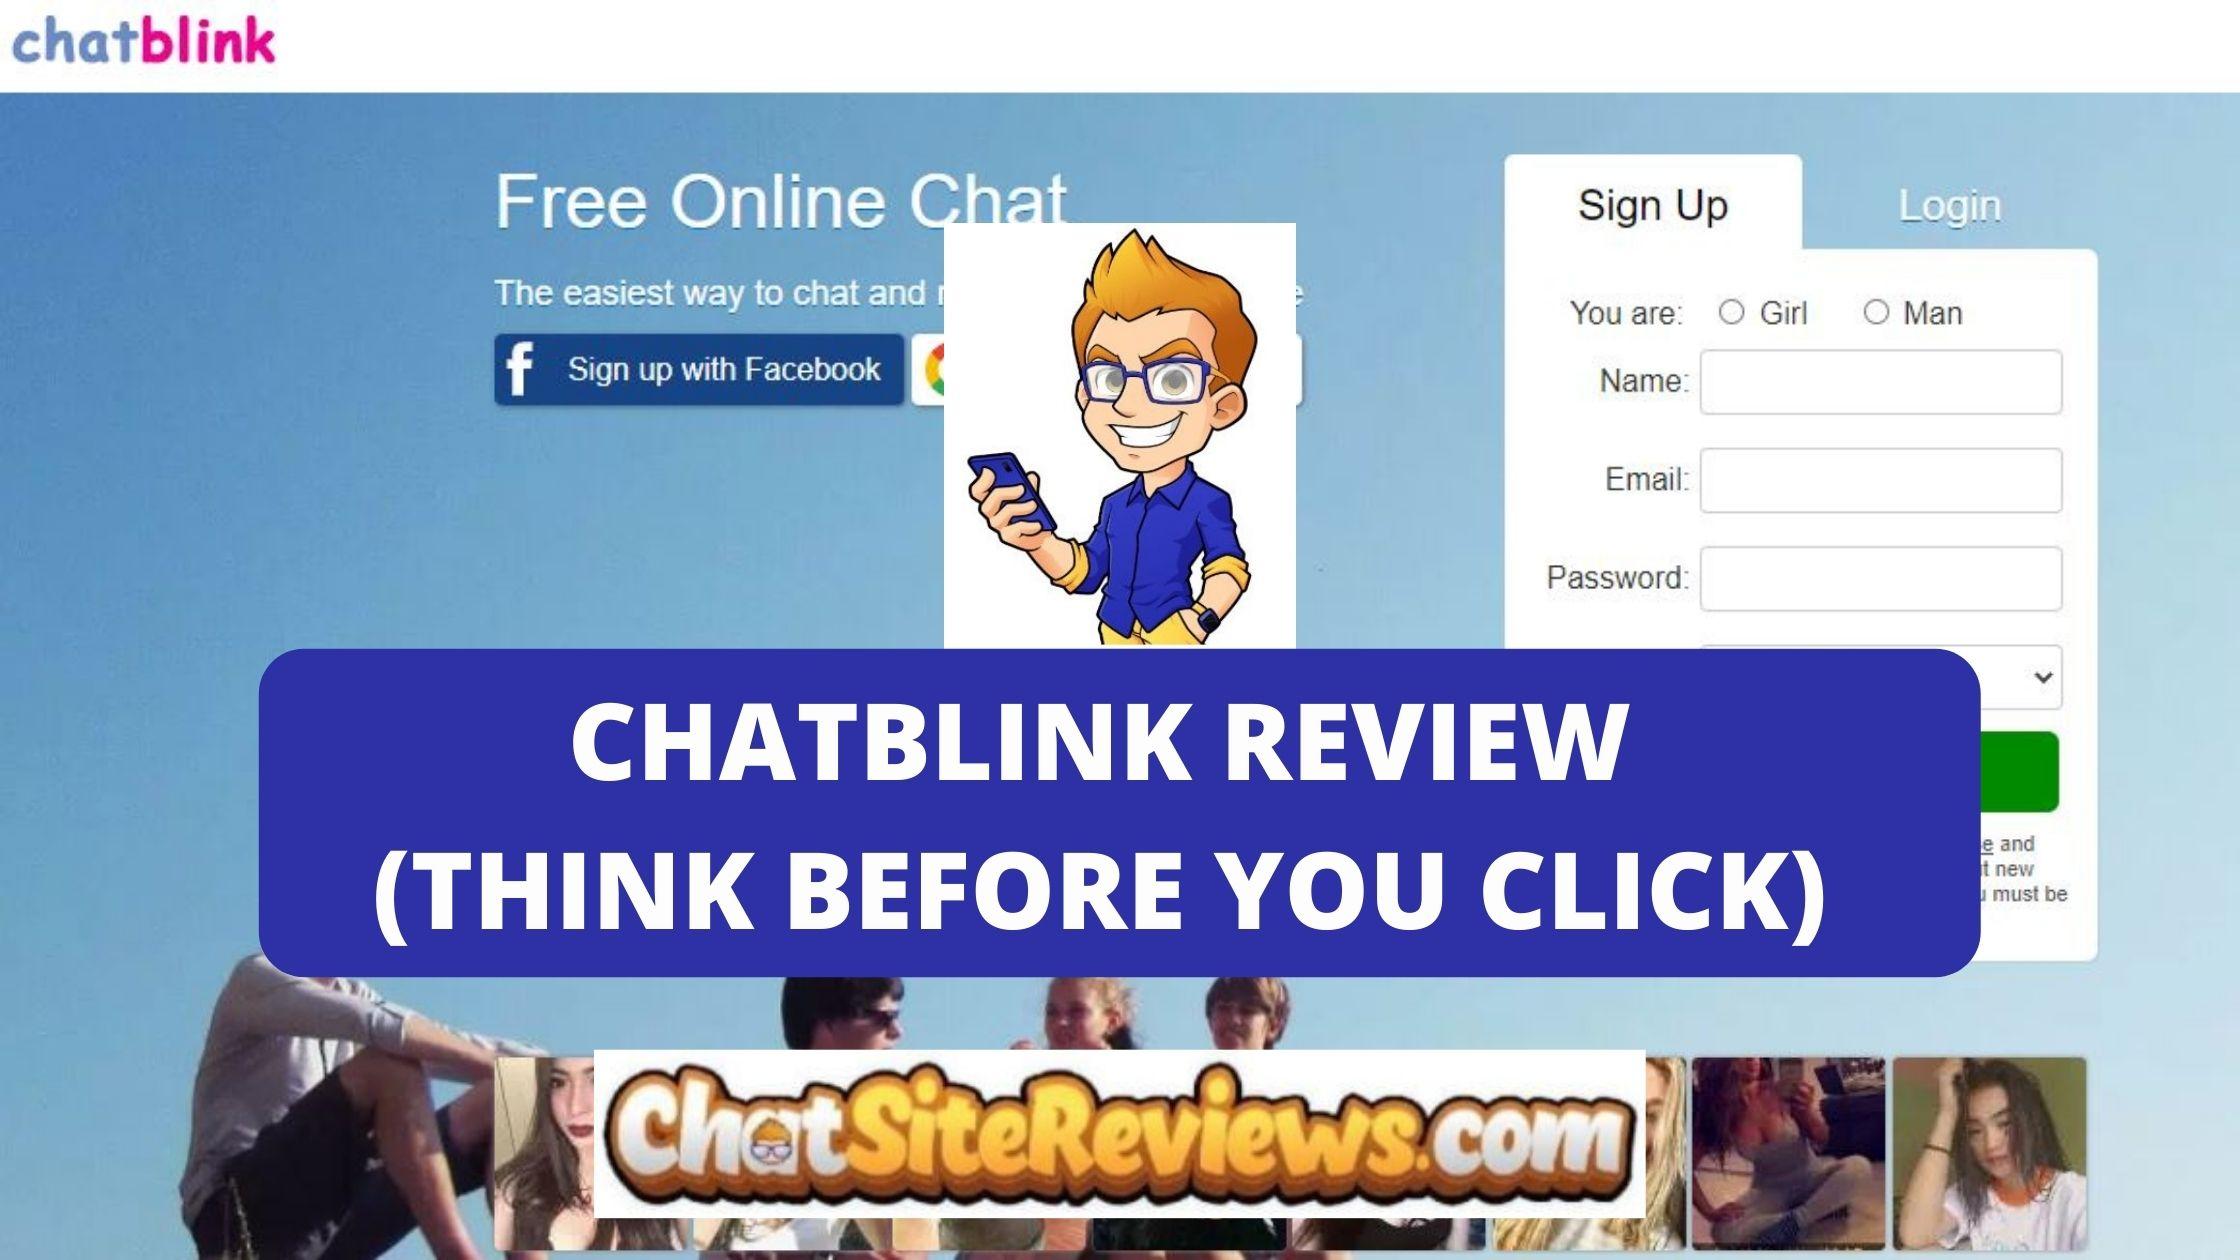 Chatblink